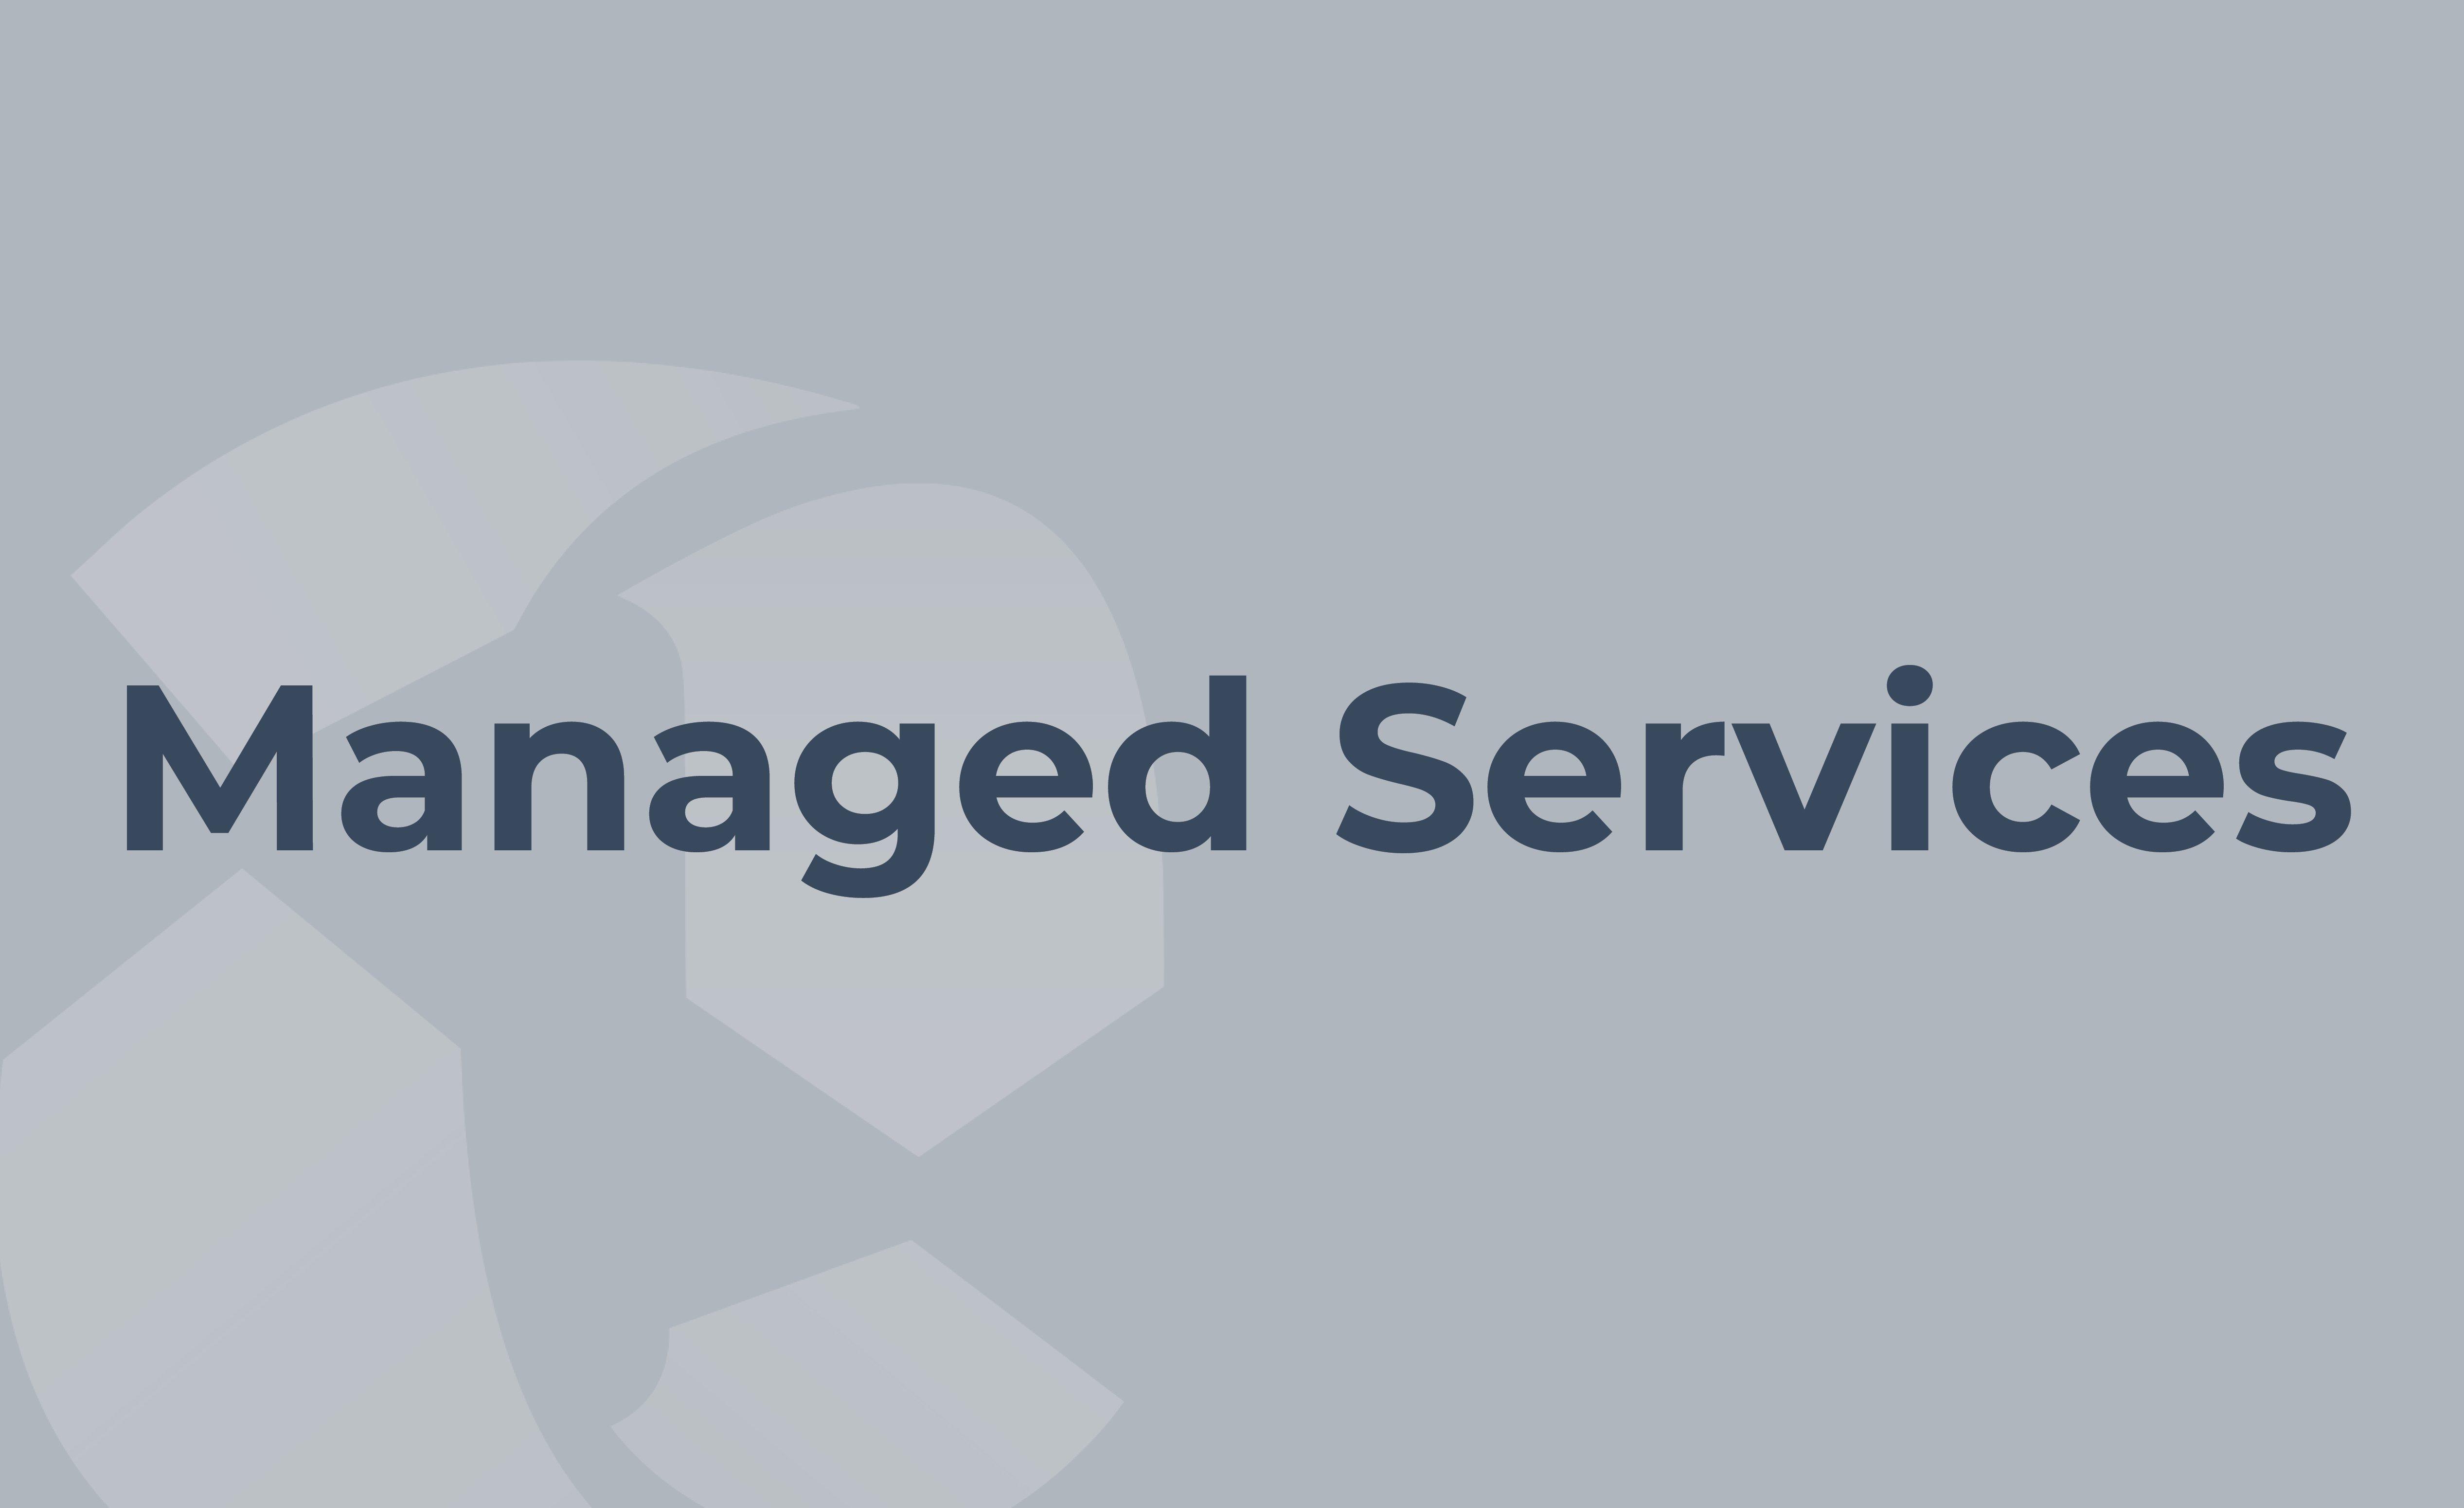 Matrix_Managed Services-1